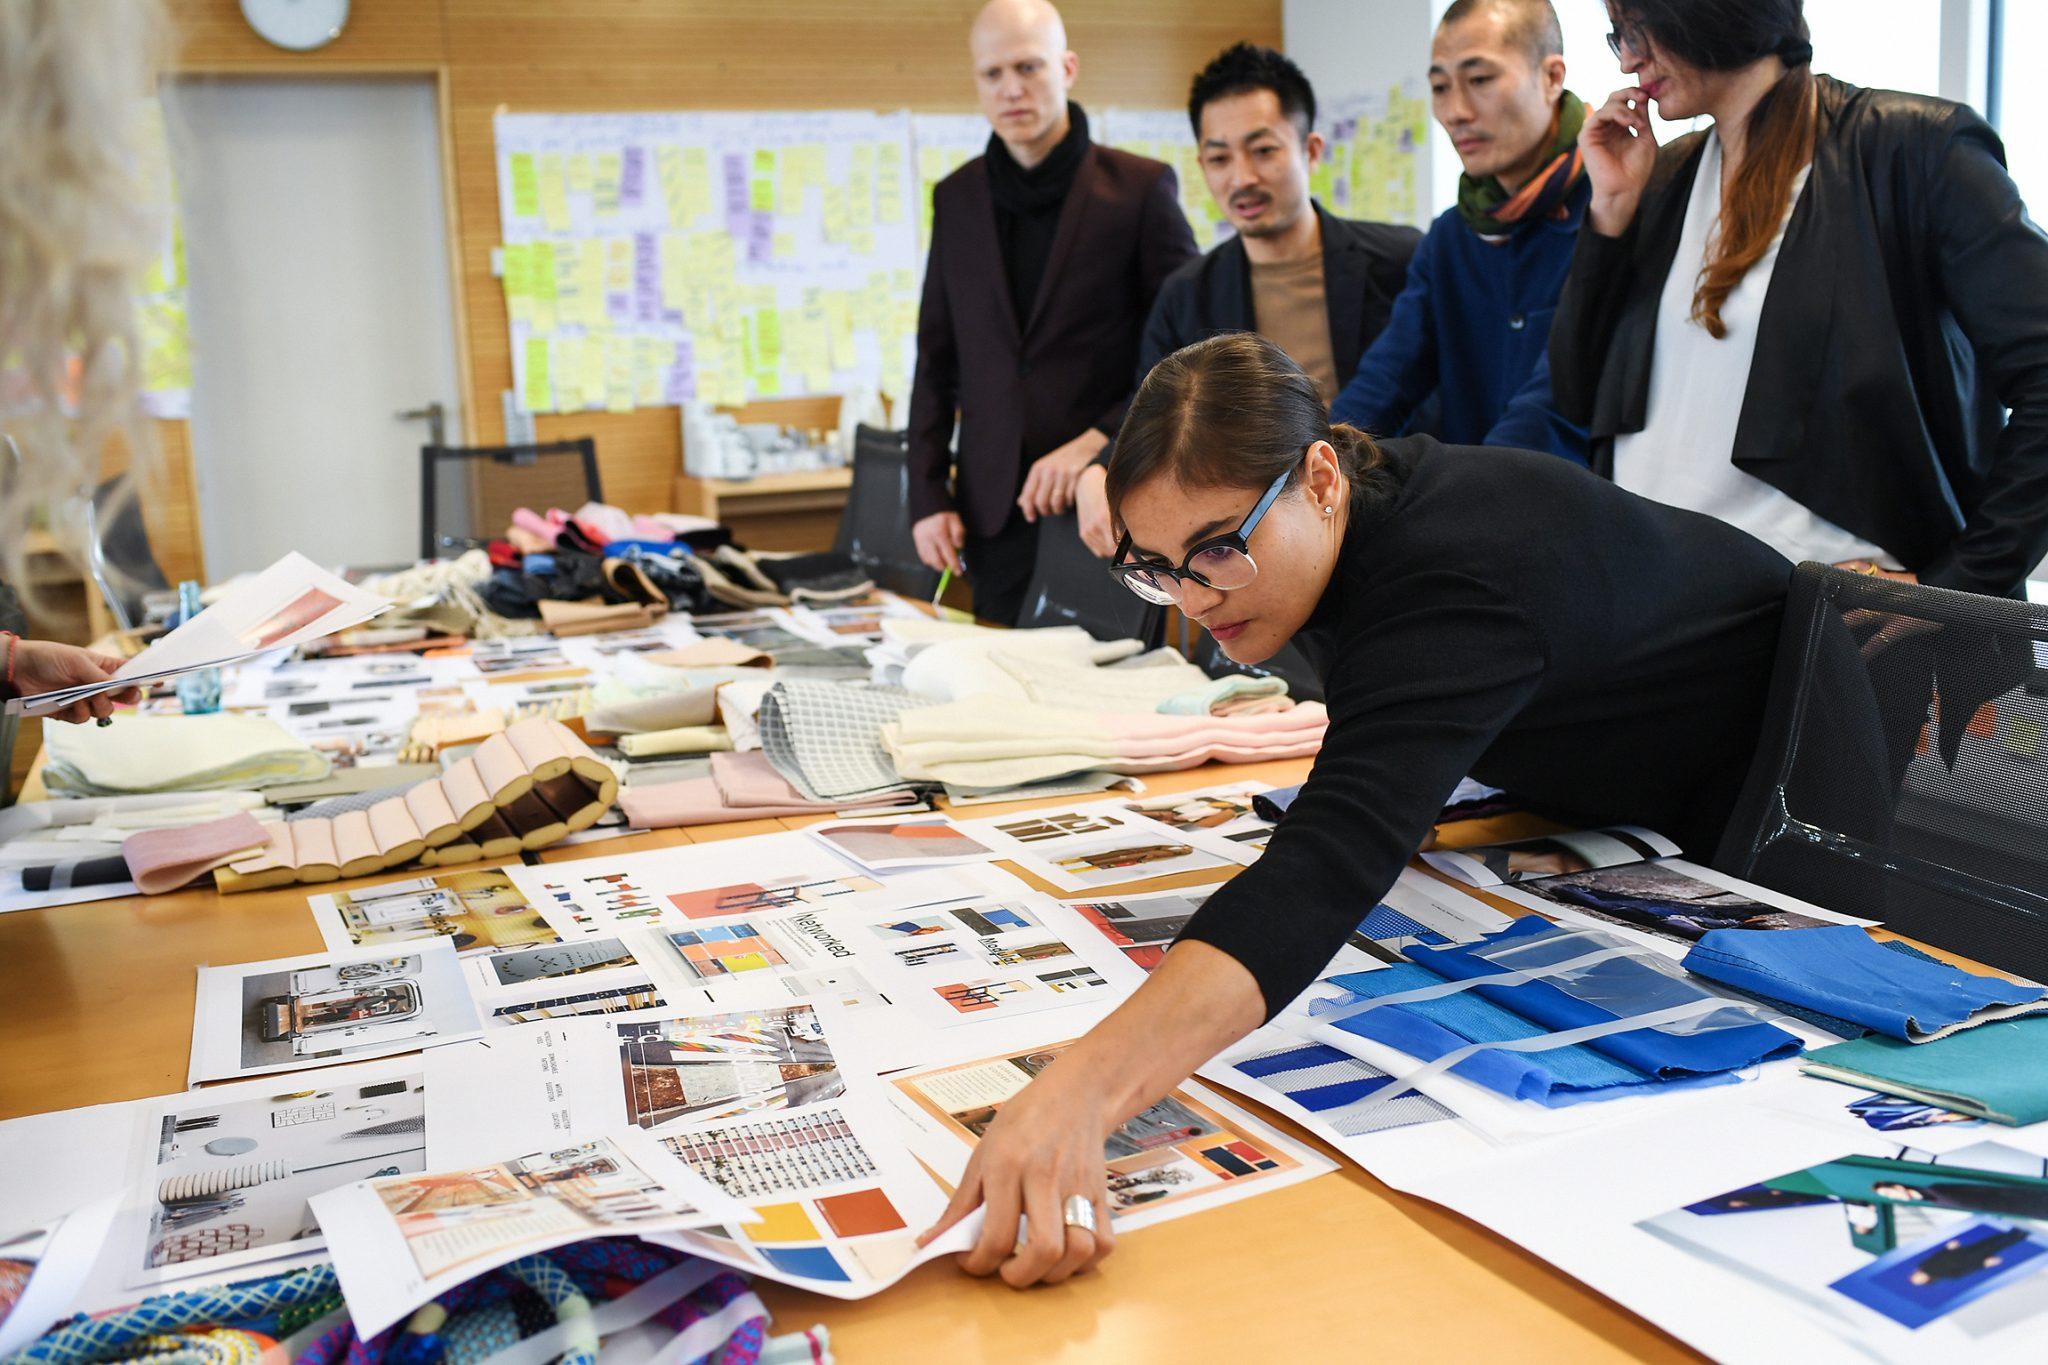 Ph: Messe Frankfurt GmbH / Pietro Sutera.